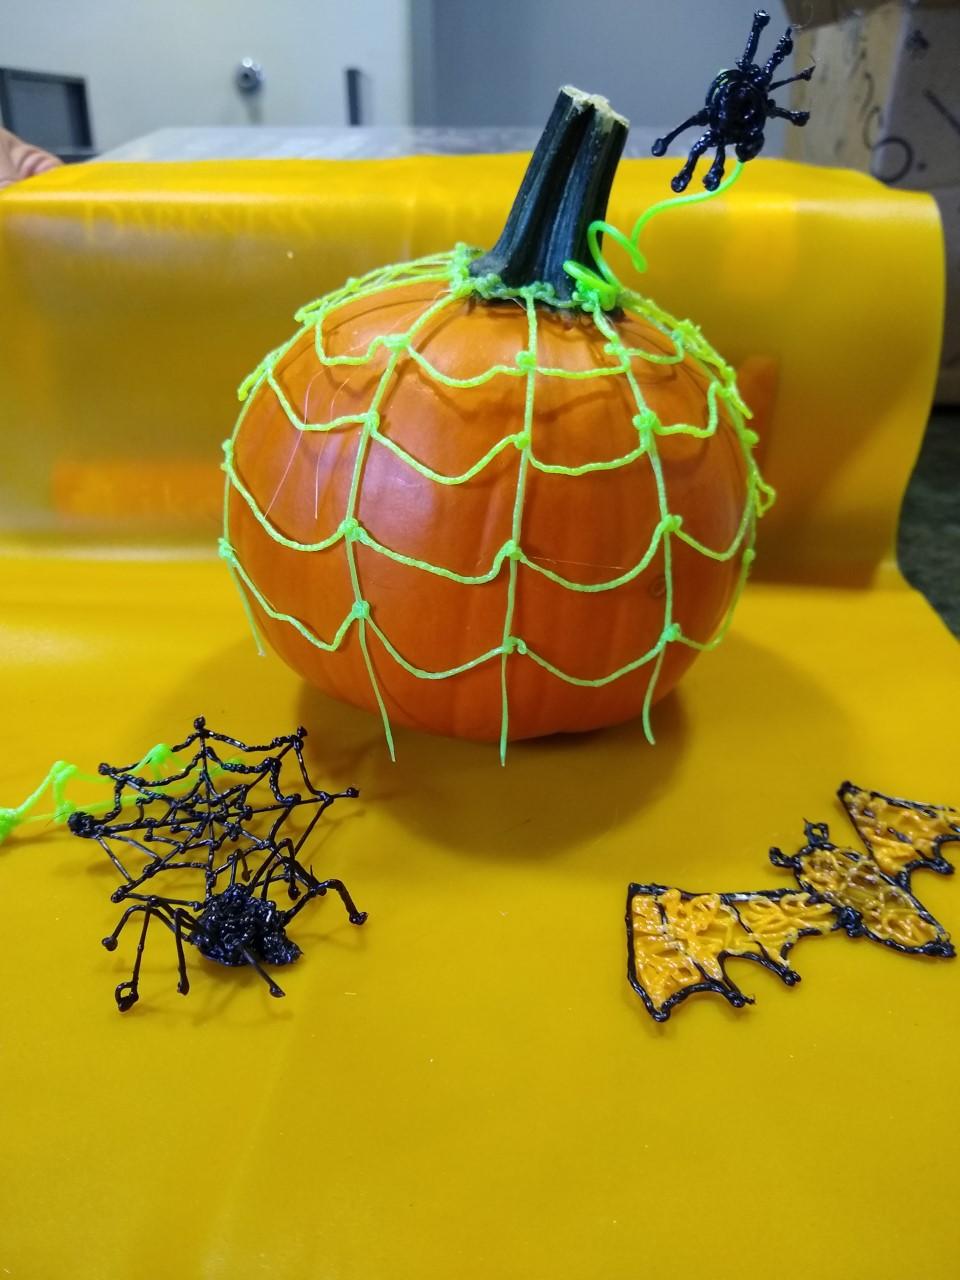 Georgetown Library Halloween 2020 3D Pen Pumpkin Decorating! | Georgetown Peabody Library